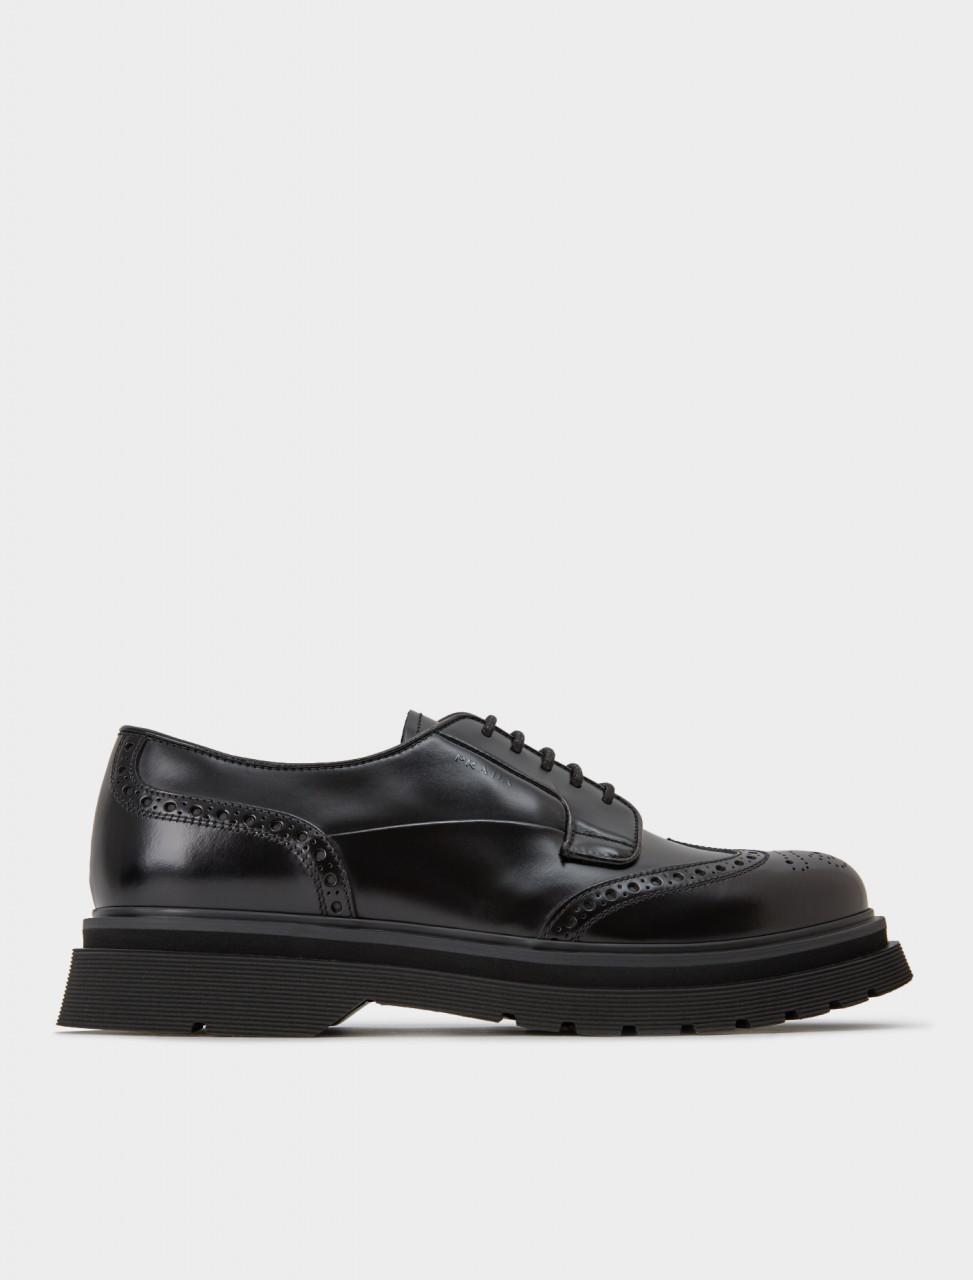 242-2EE347-B4L-F0002 PRADA Brushed Leather Brogue Shoe